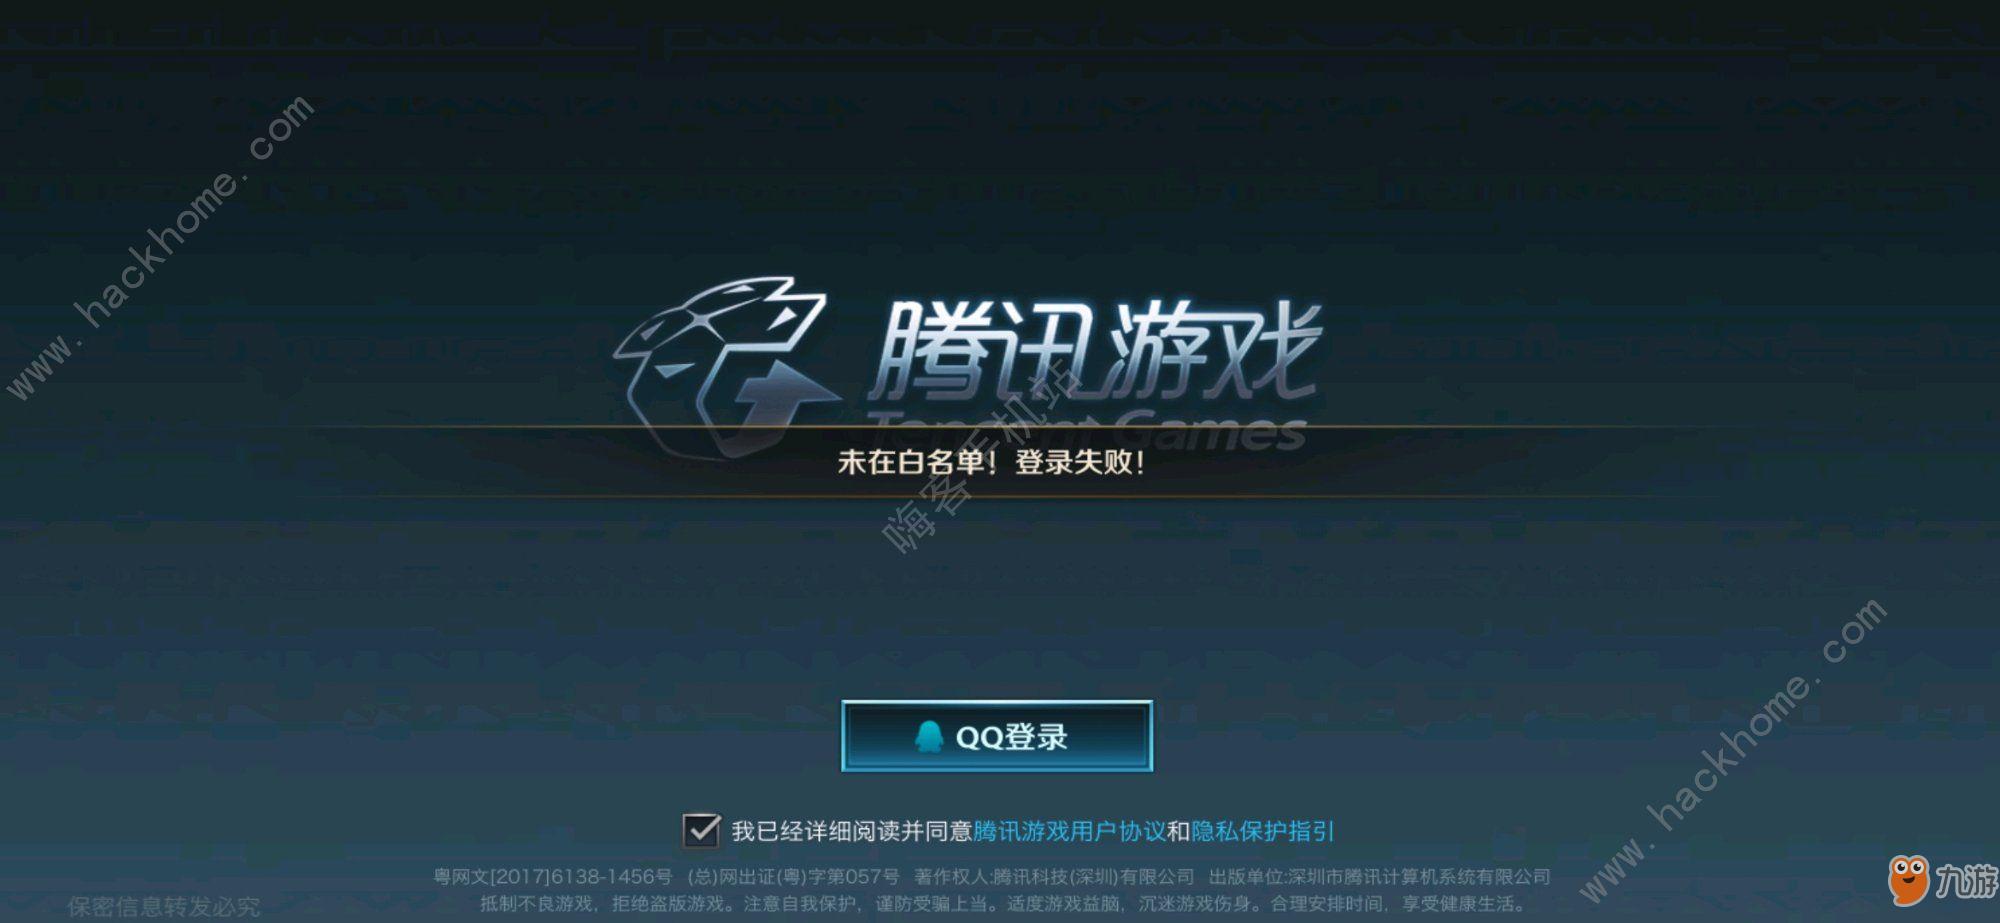 http://www.youxixj.com/remengonglue/129718.html